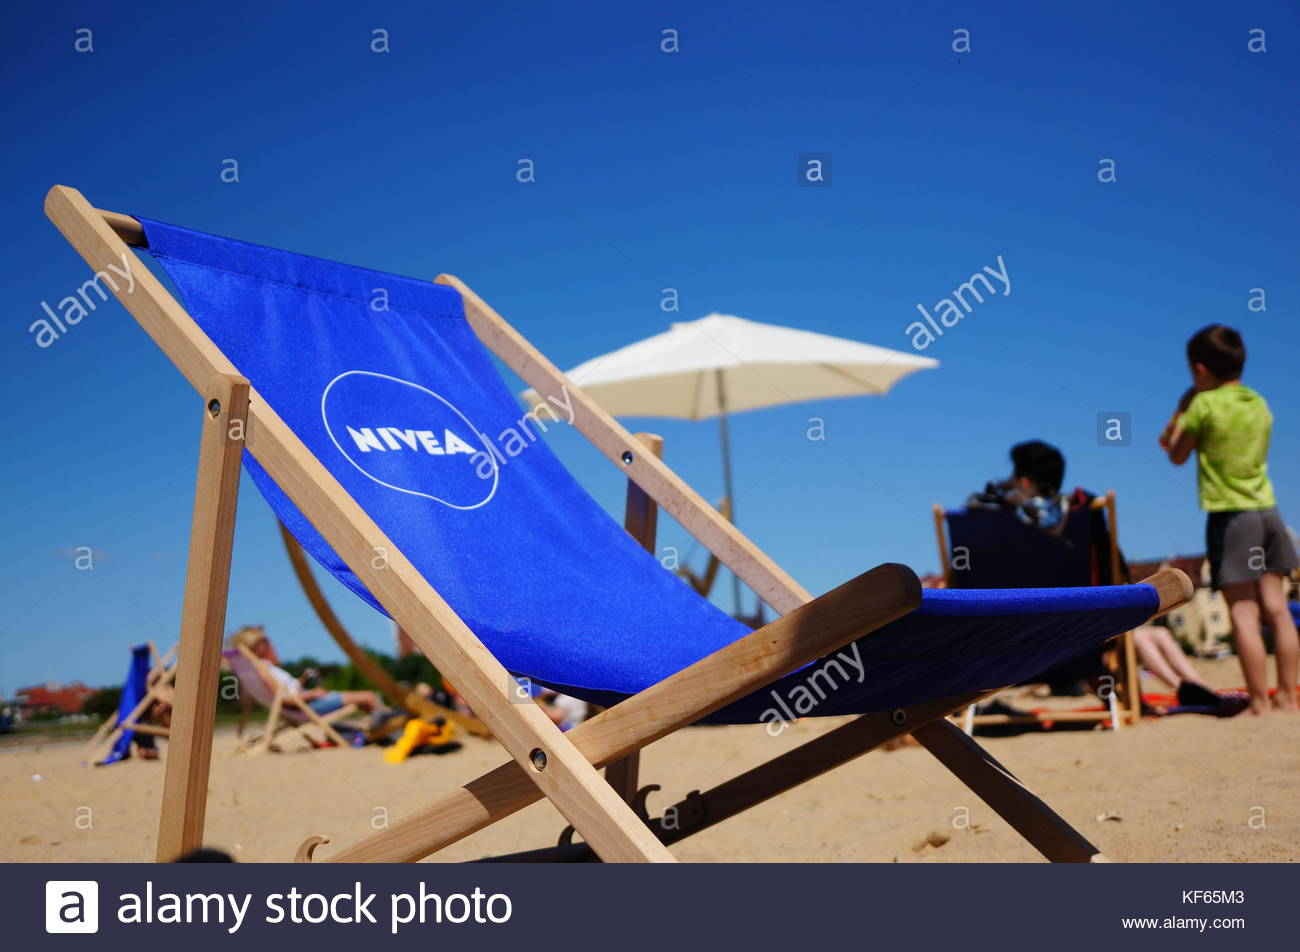 POZNAN, POLAND - JUNE 04, 2015: Blue sun bed with Nivea logo at a city beach - Stock Image